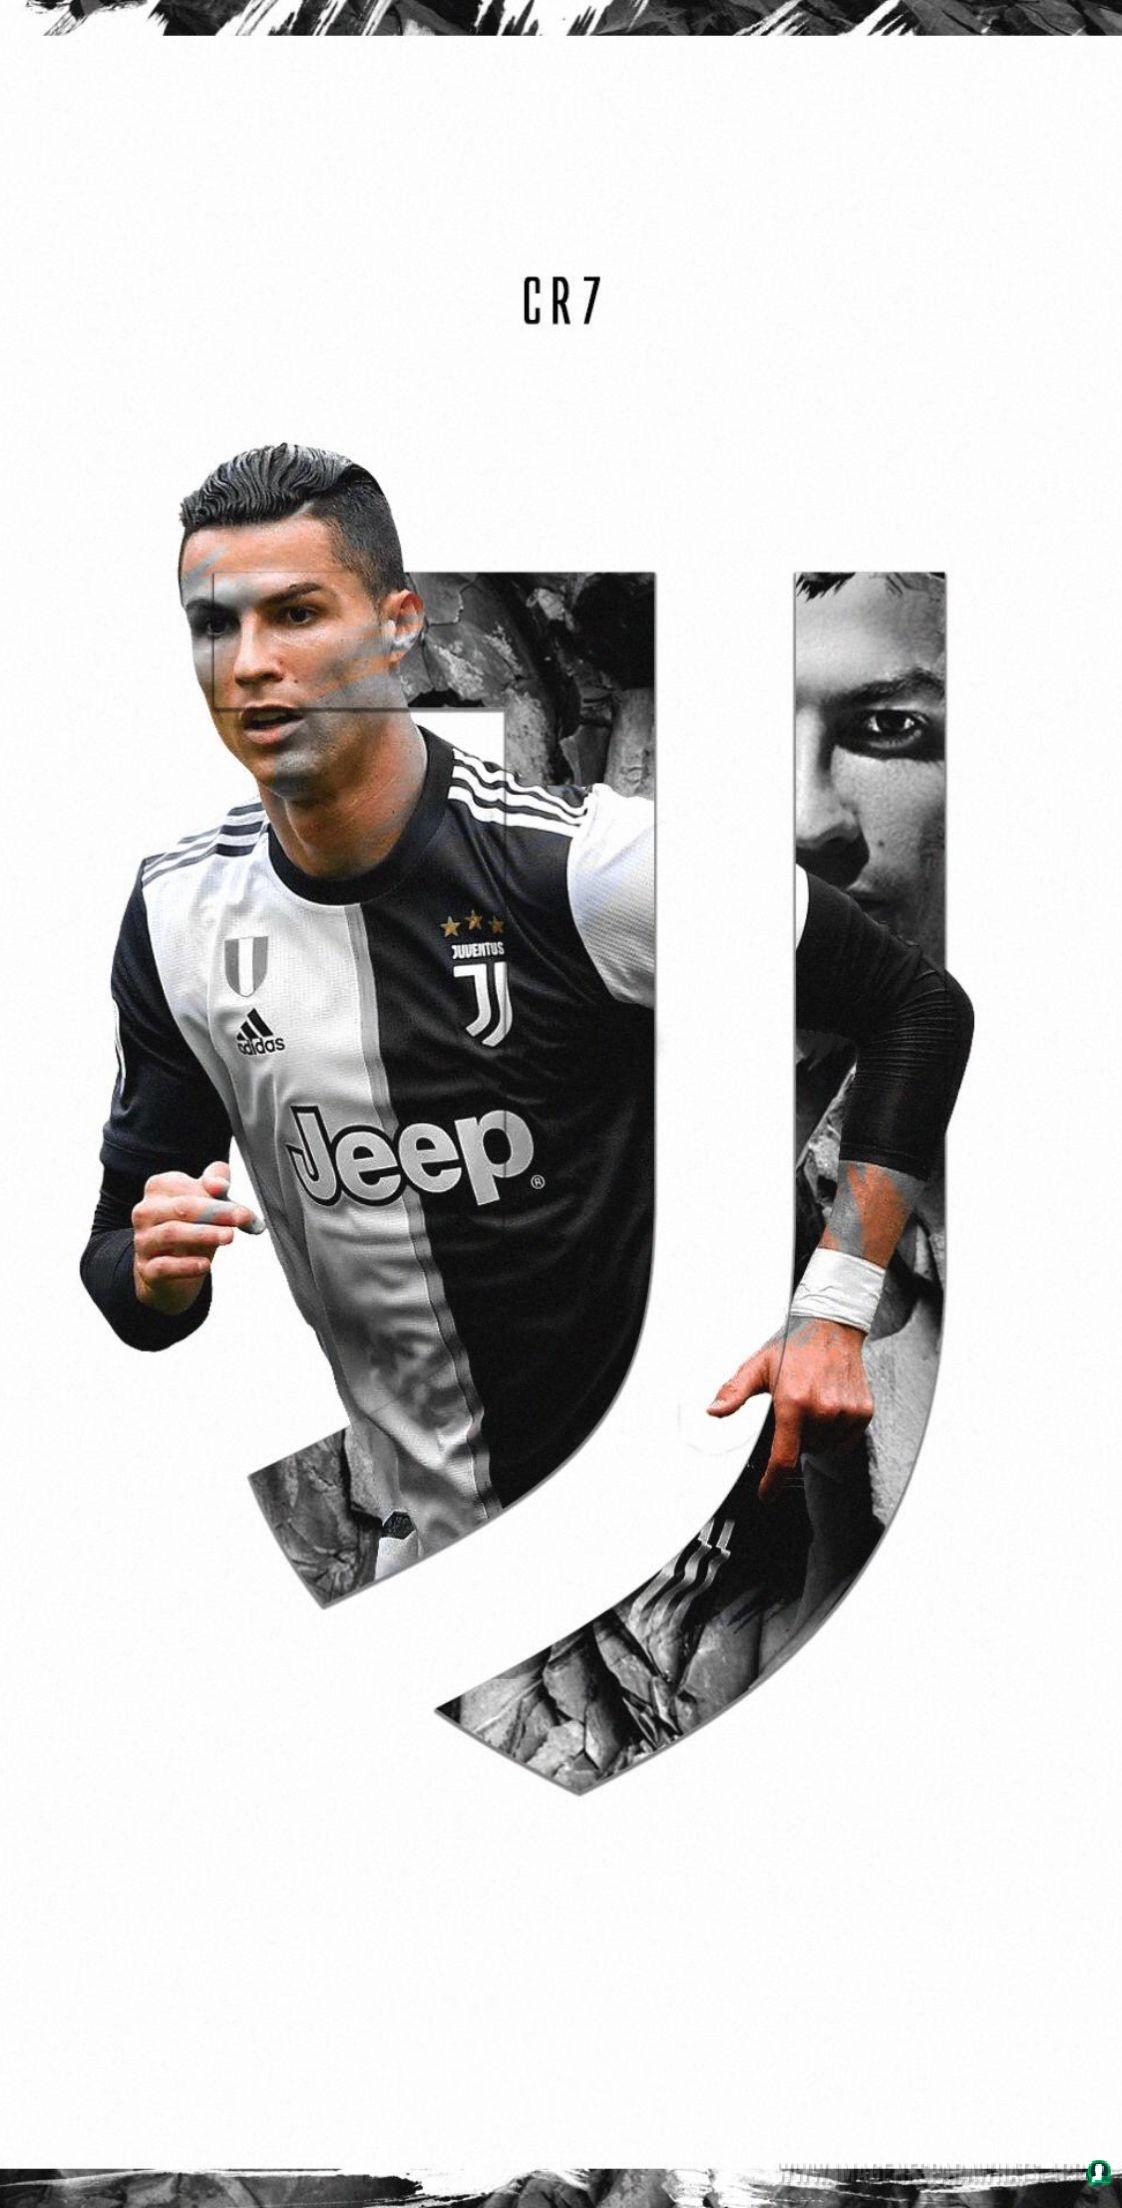 Imagenes de Futbol (1220)